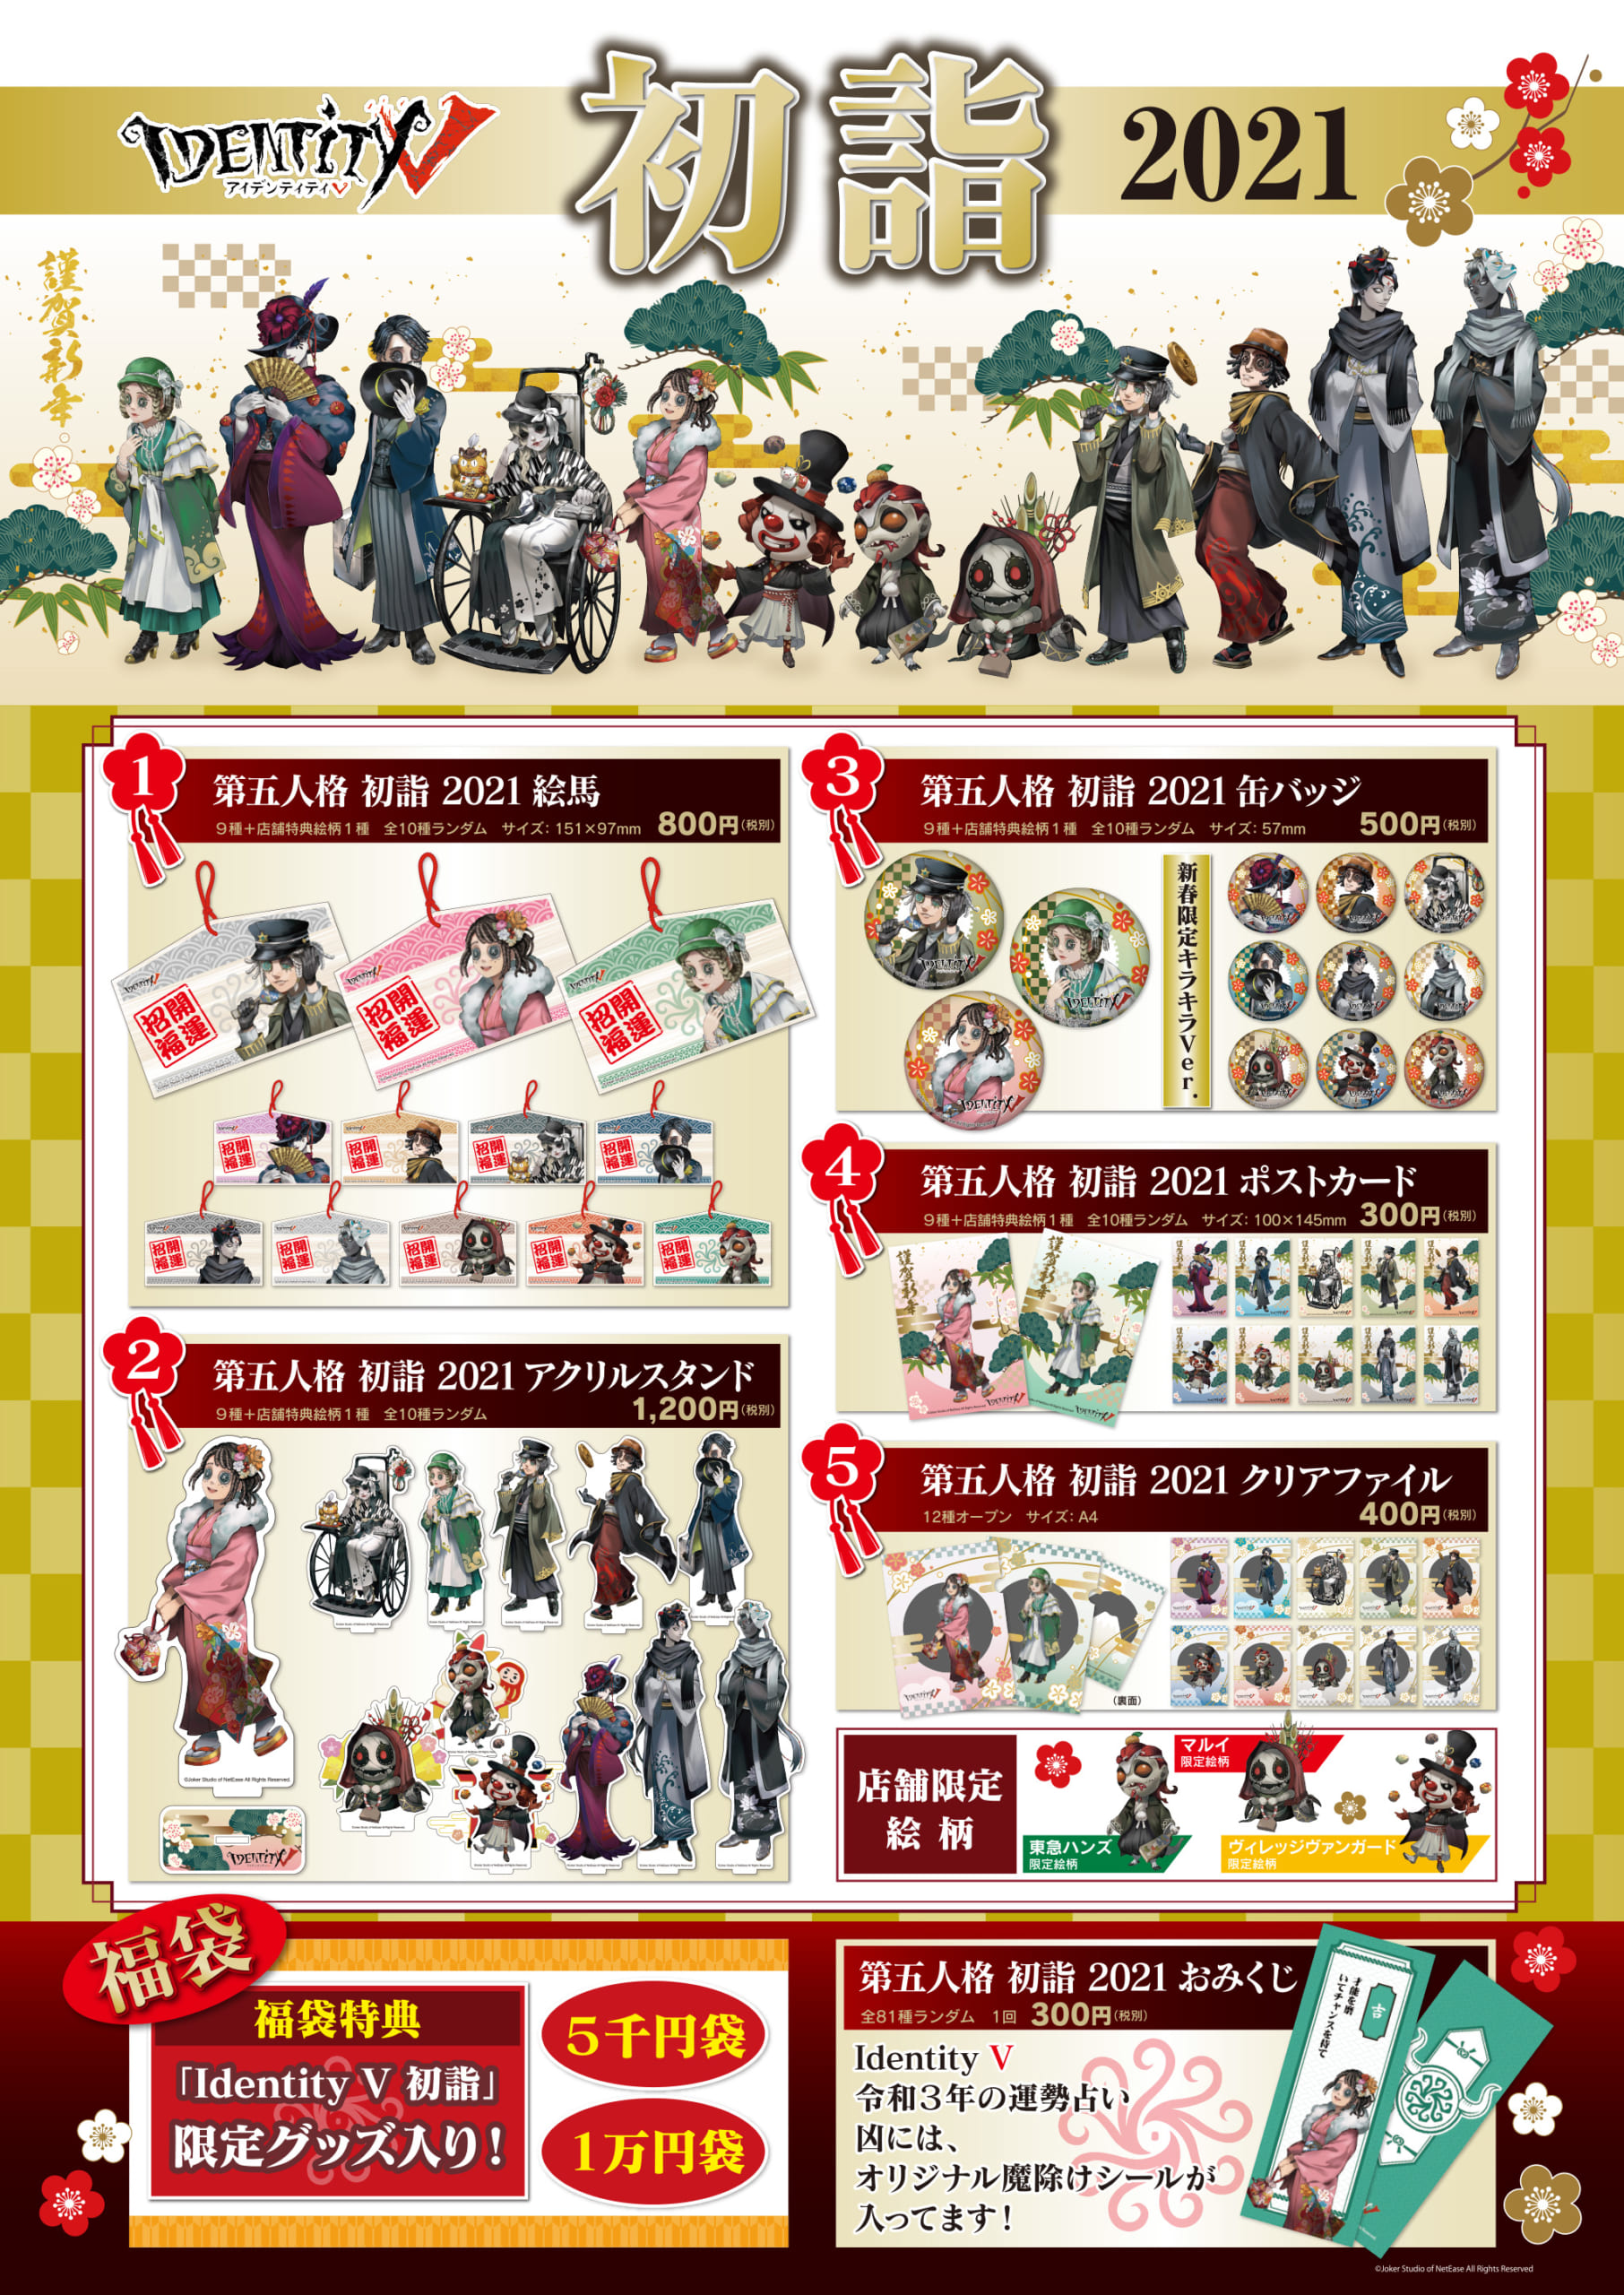 「Identity V 第五人格」初詣がテーマのPOP UP STOREが全国で開催決定!東京・大阪には「第五人格神社」も到来